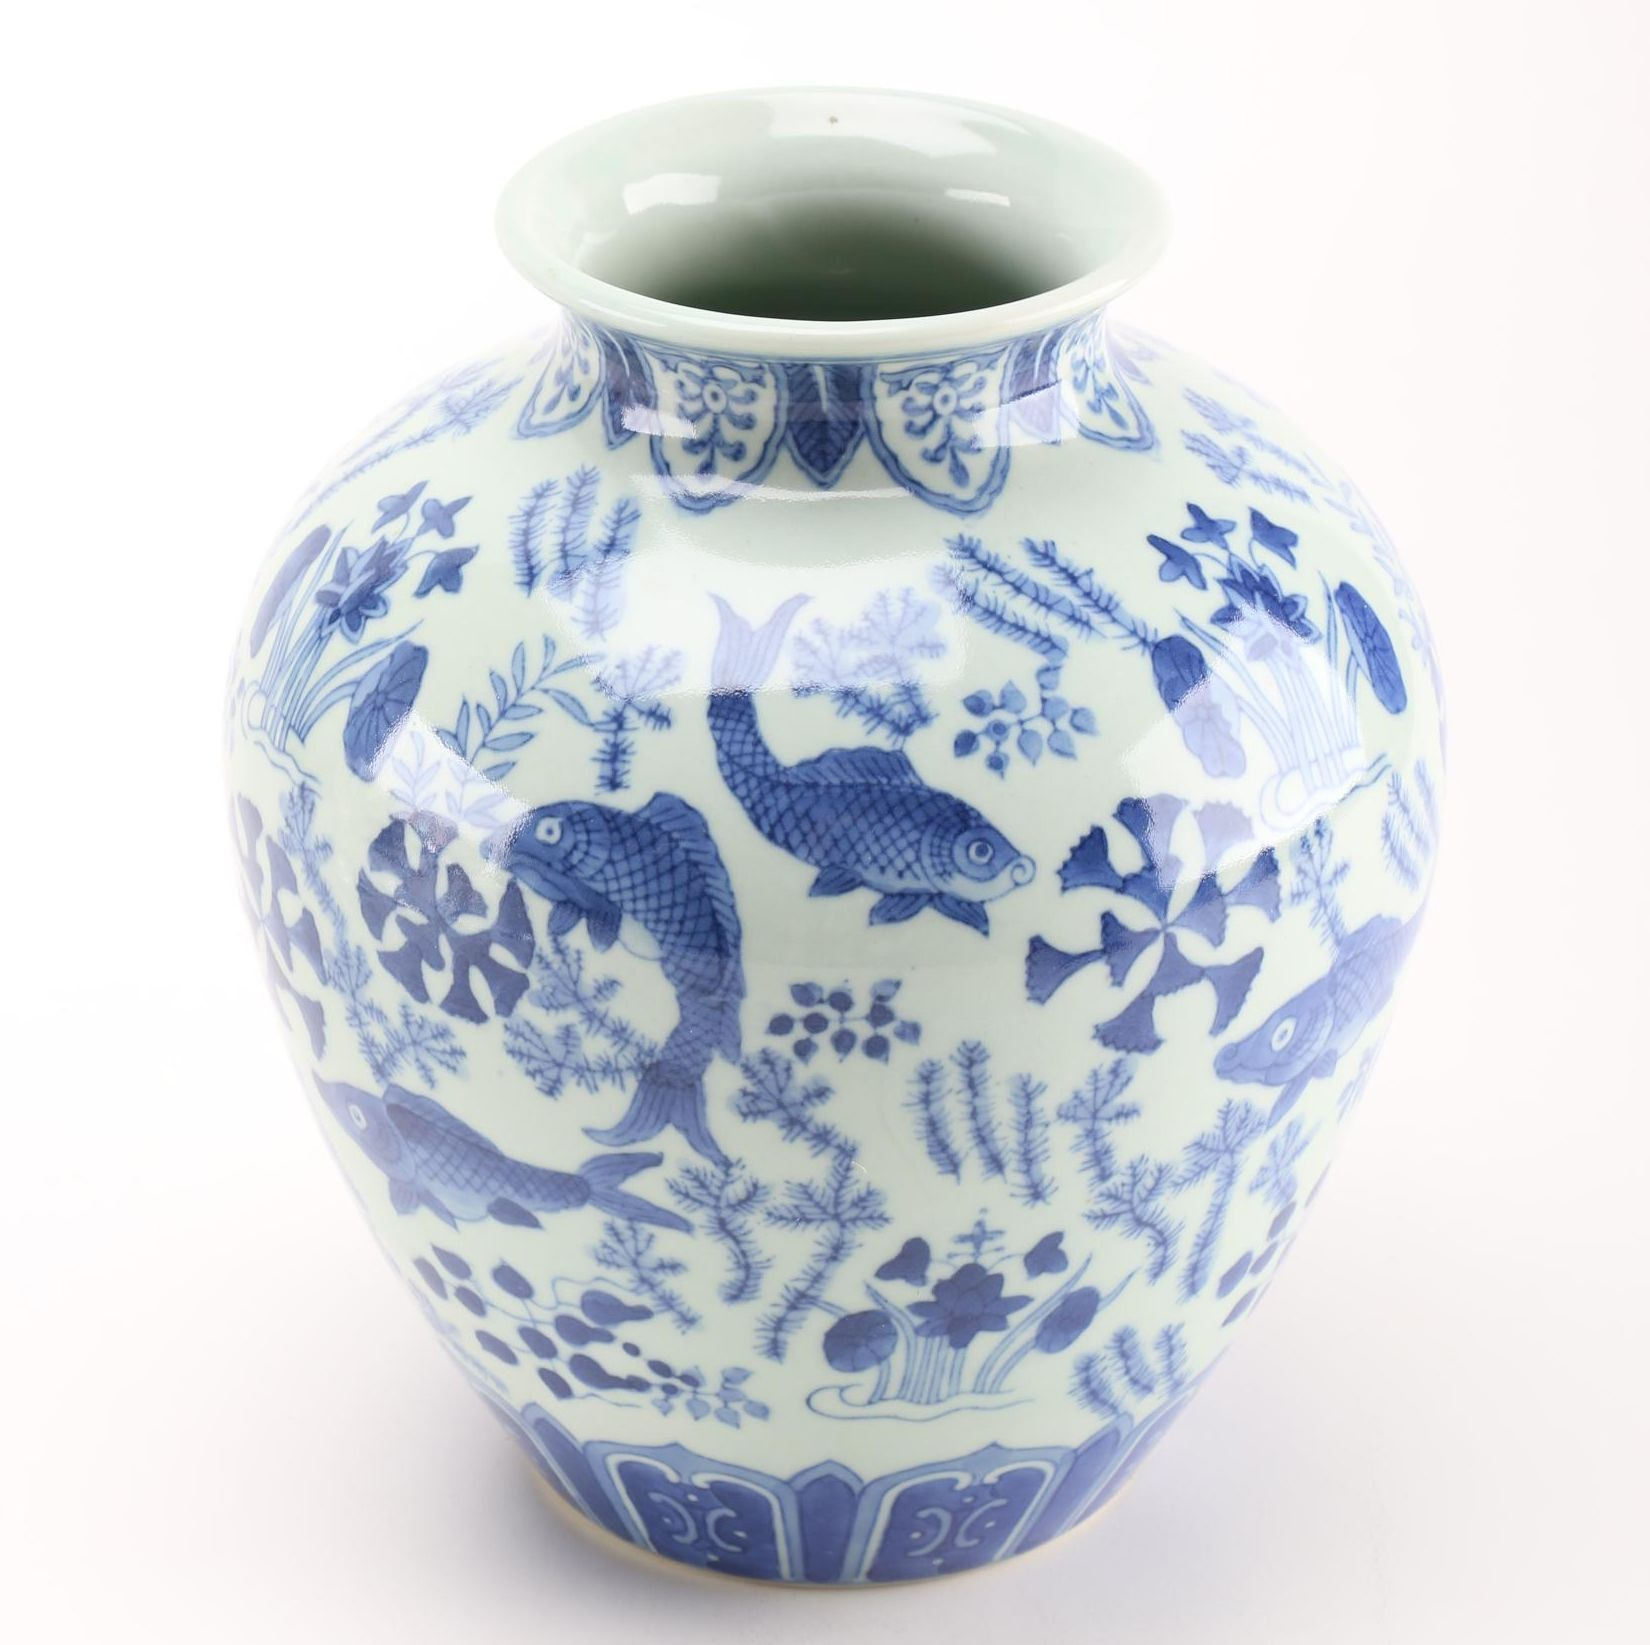 Chinese Blue and White Porcelain Koi Fish Vase